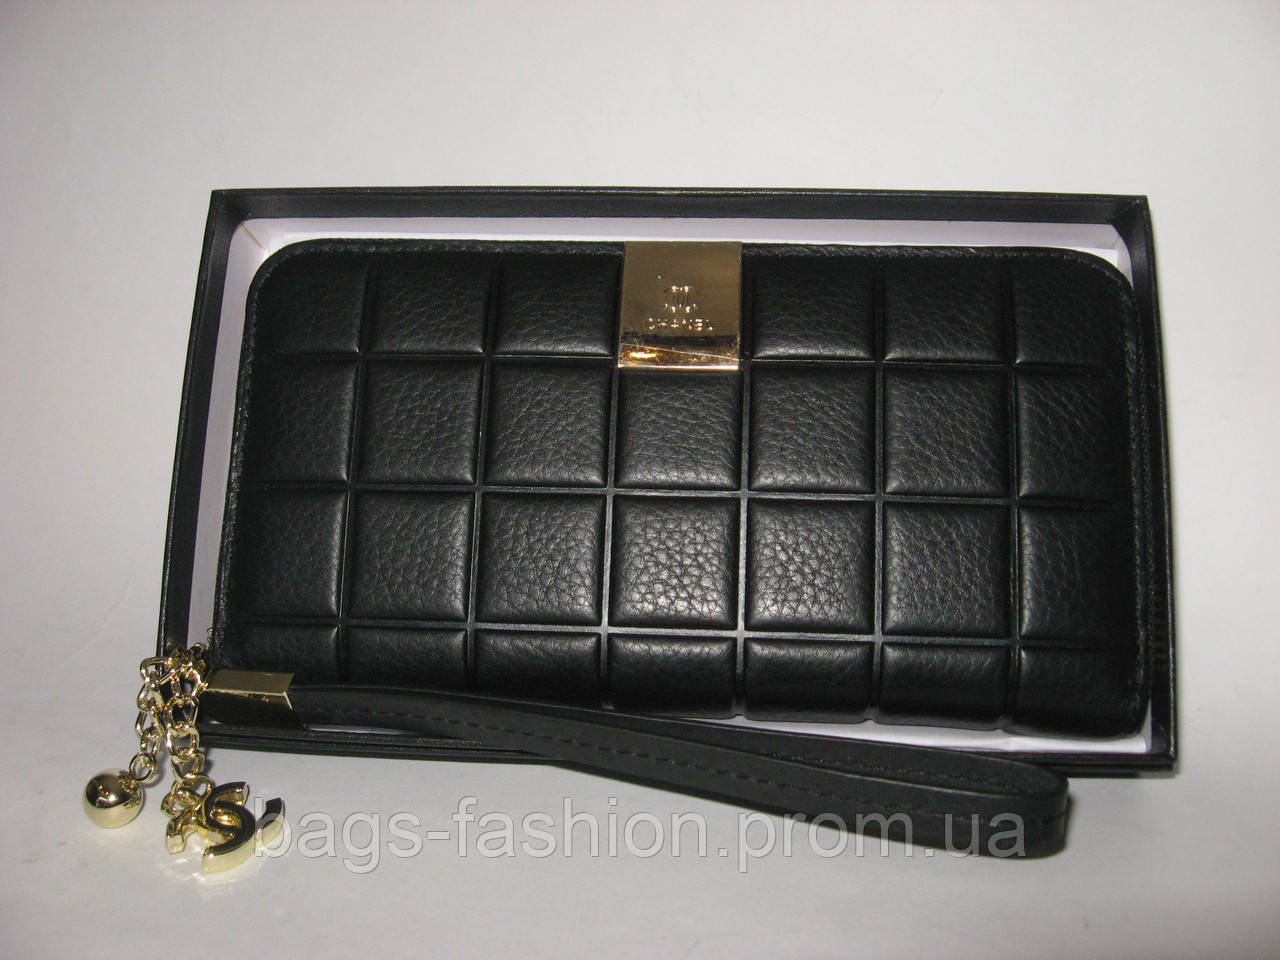 0720f0e2dea8 кошелек Chanel на змейке натуральная кожа реплика цена 750 грн